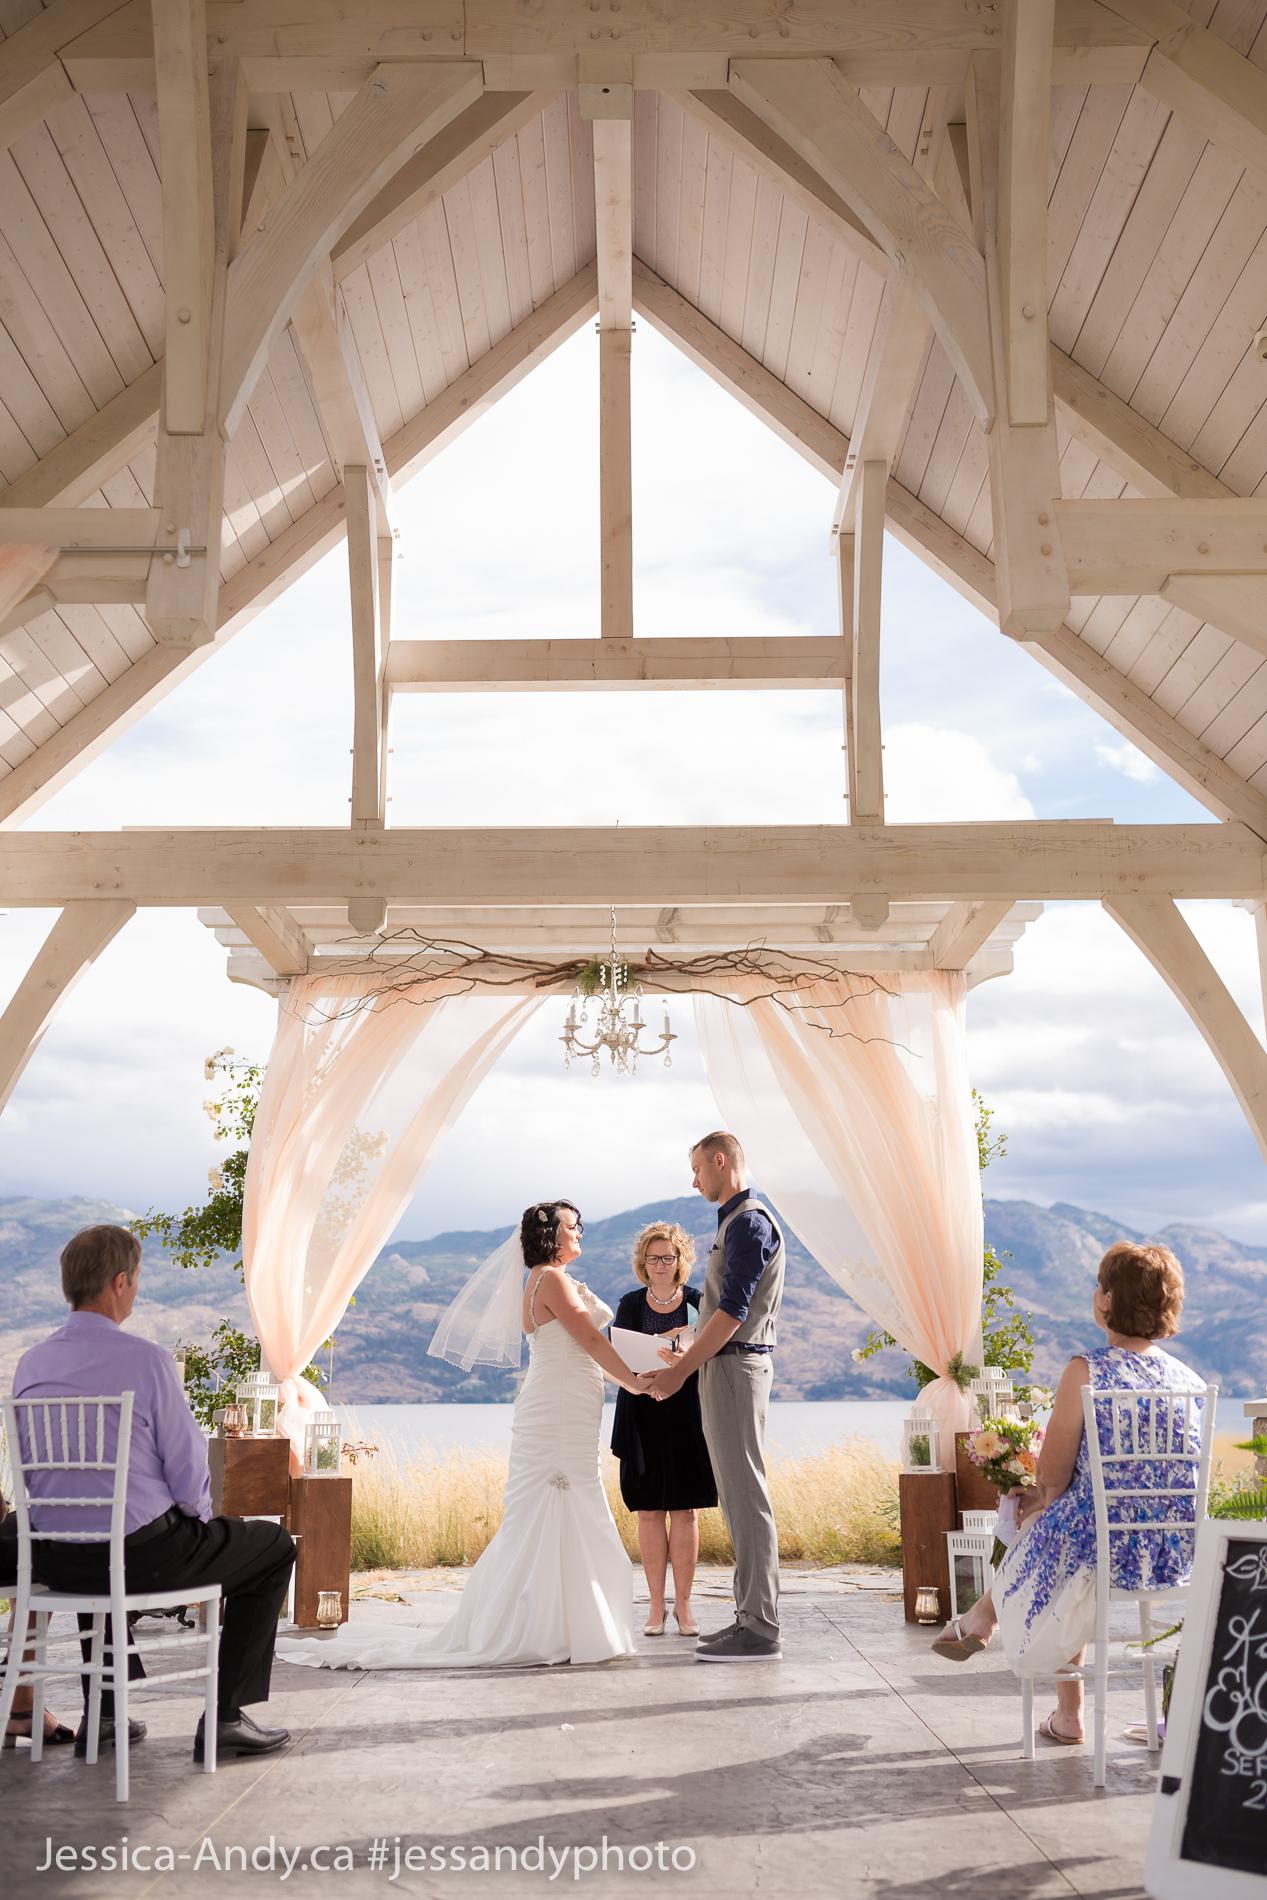 Kelowna Wedding Venue - Ceremony